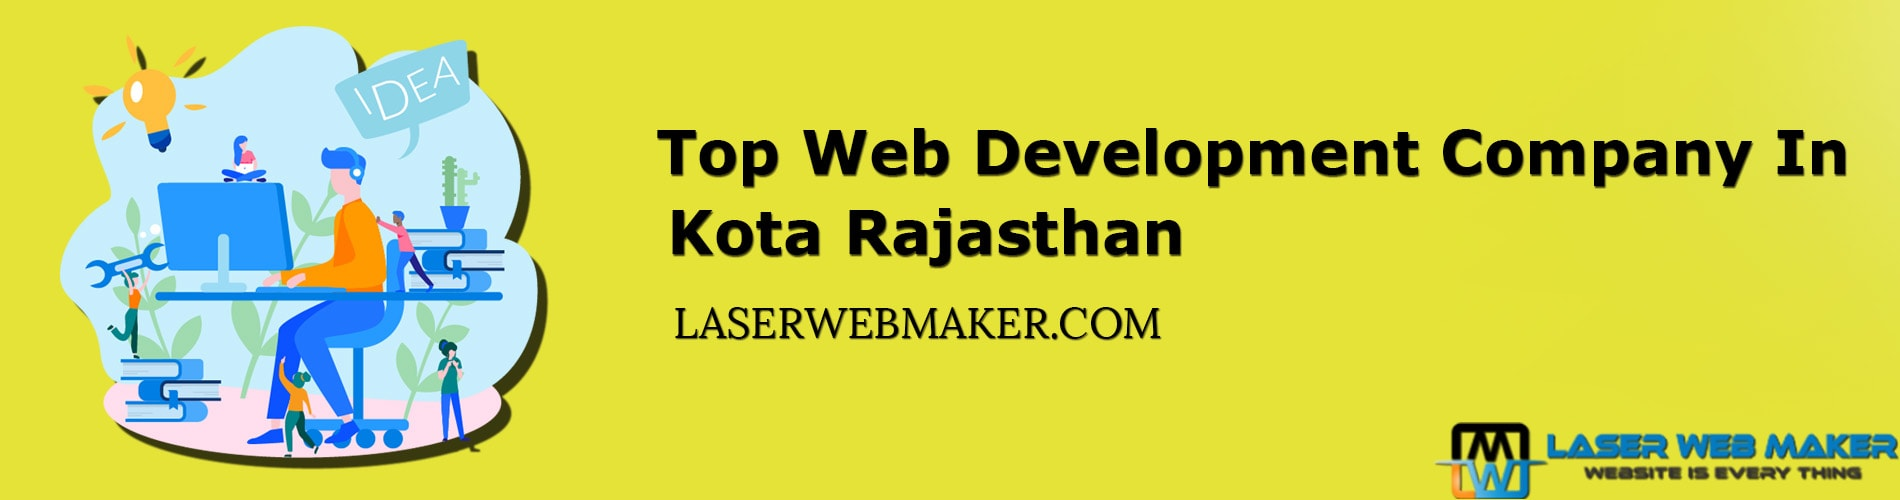 Top Web Development Company In Kota Rajasthan